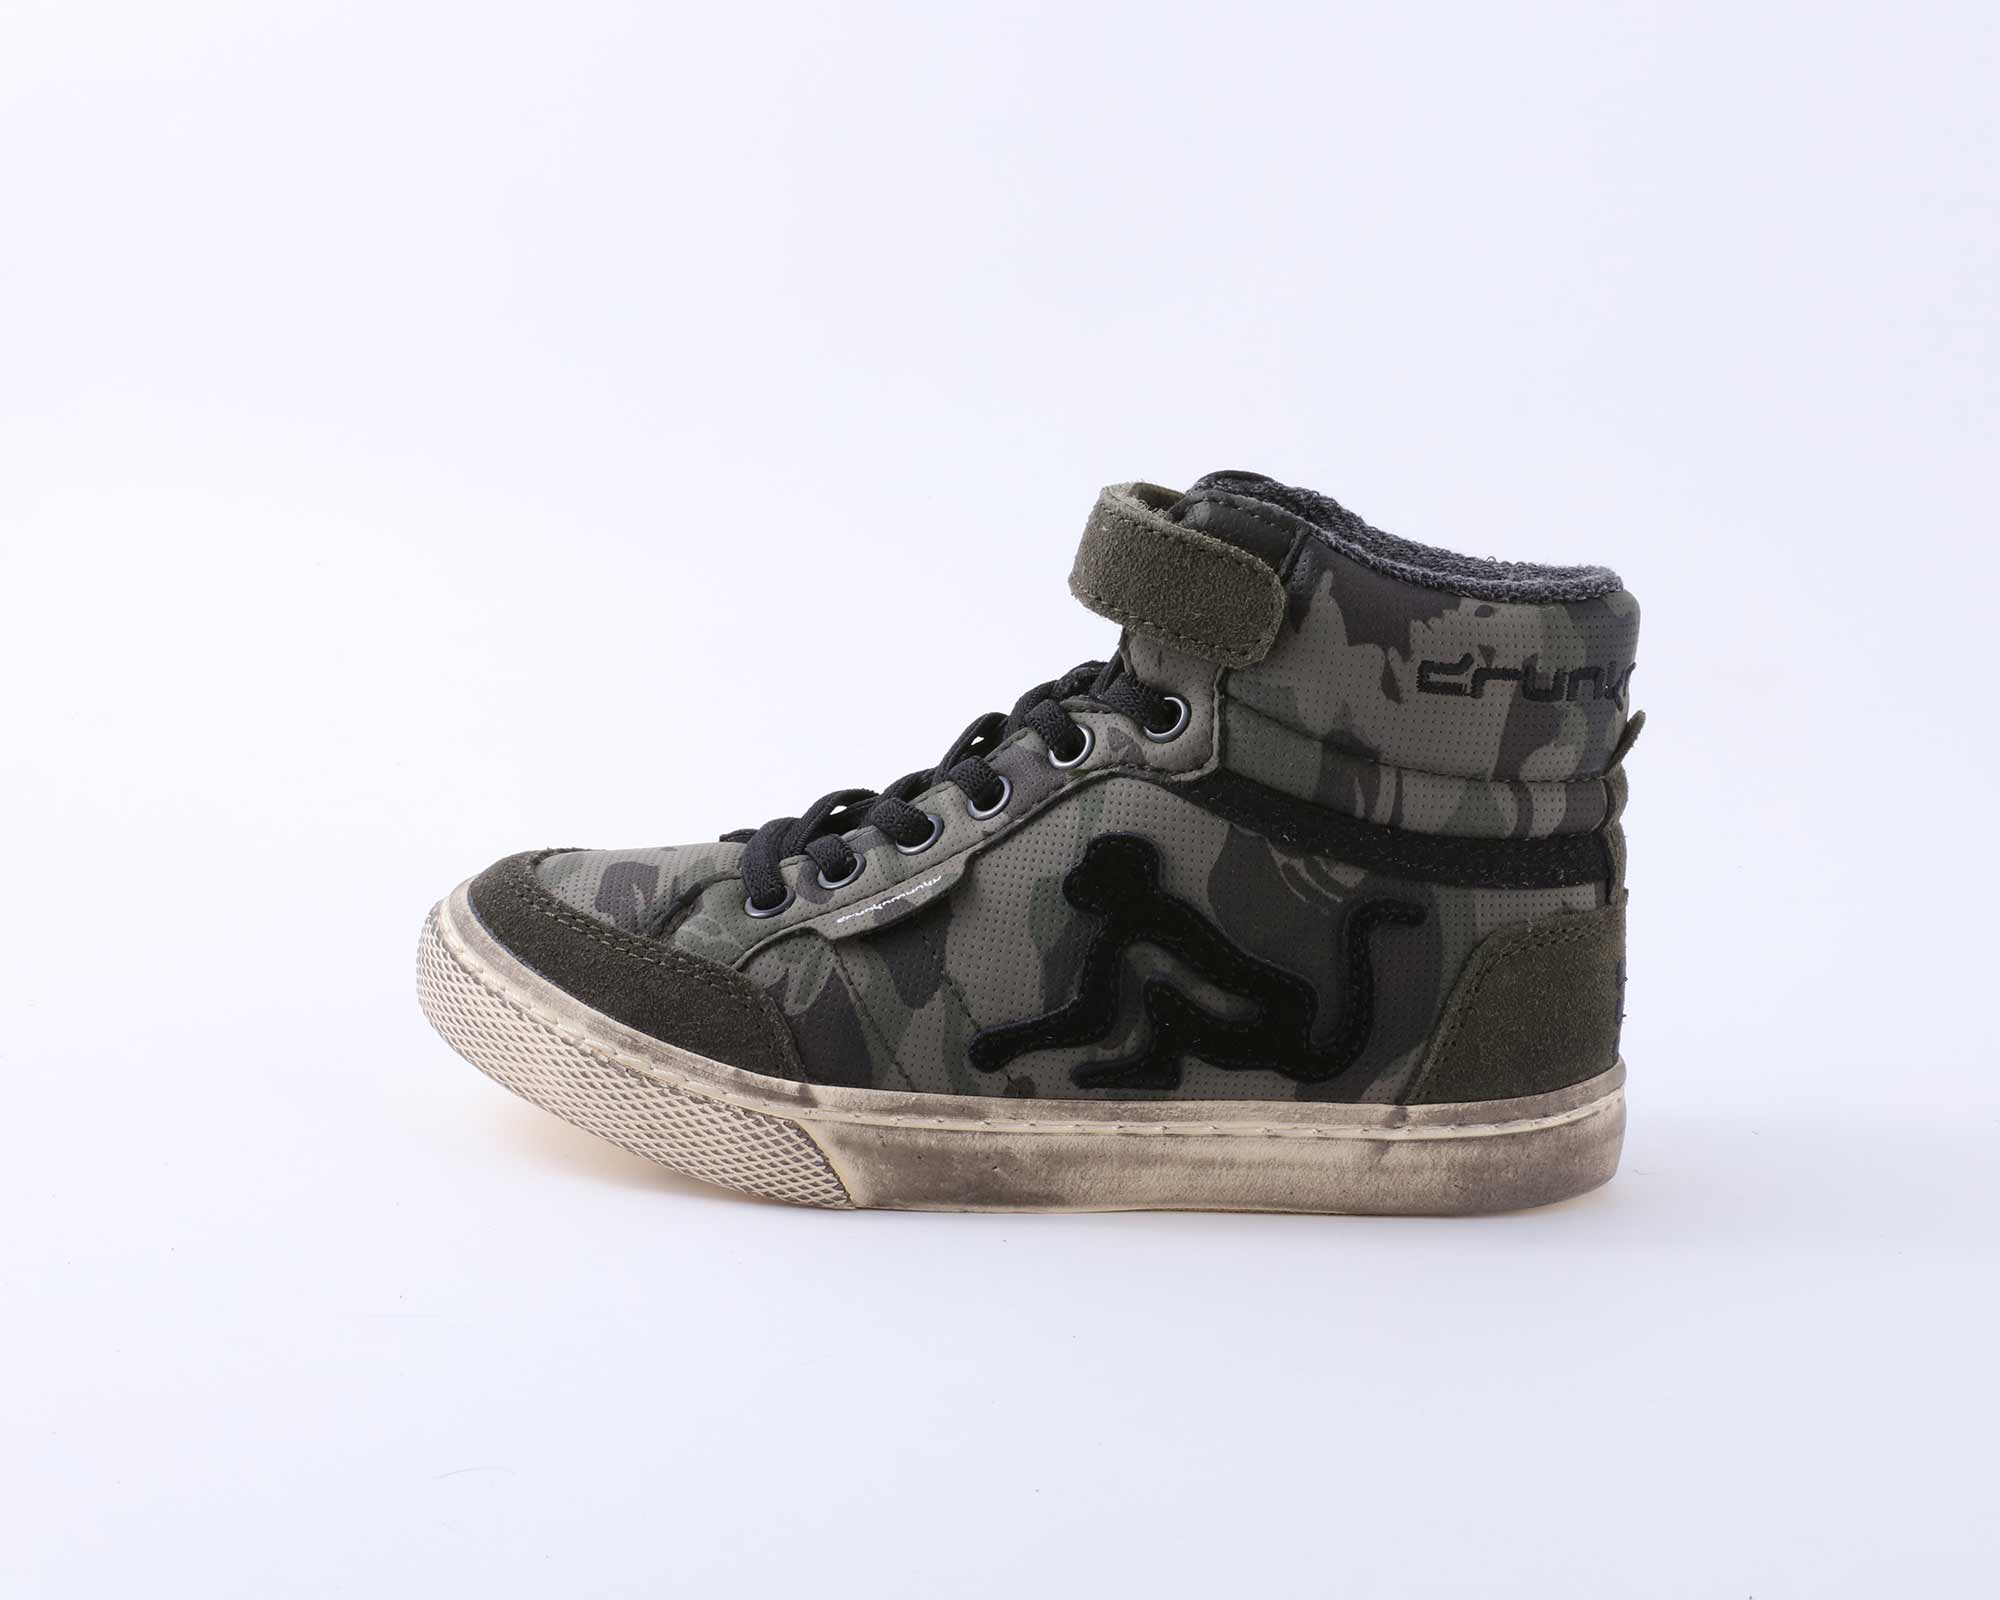 online retailer b4503 2623f Drunknmunky Boston Camu Military Green K19